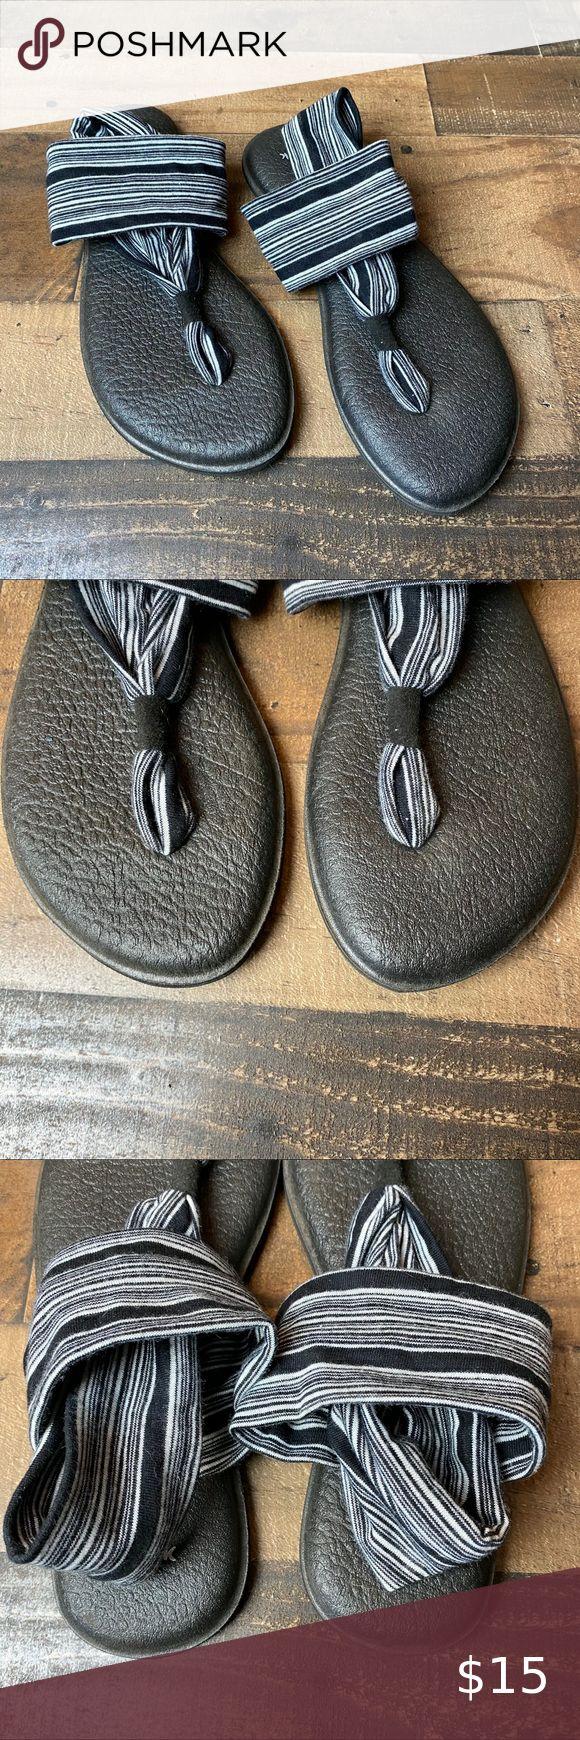 Predownload: Sanuk Yoga Sling 2 Black White Striped Sandals In 2020 Striped Sandals Sanuk Sanuk Yoga Sling [ 1740 x 580 Pixel ]